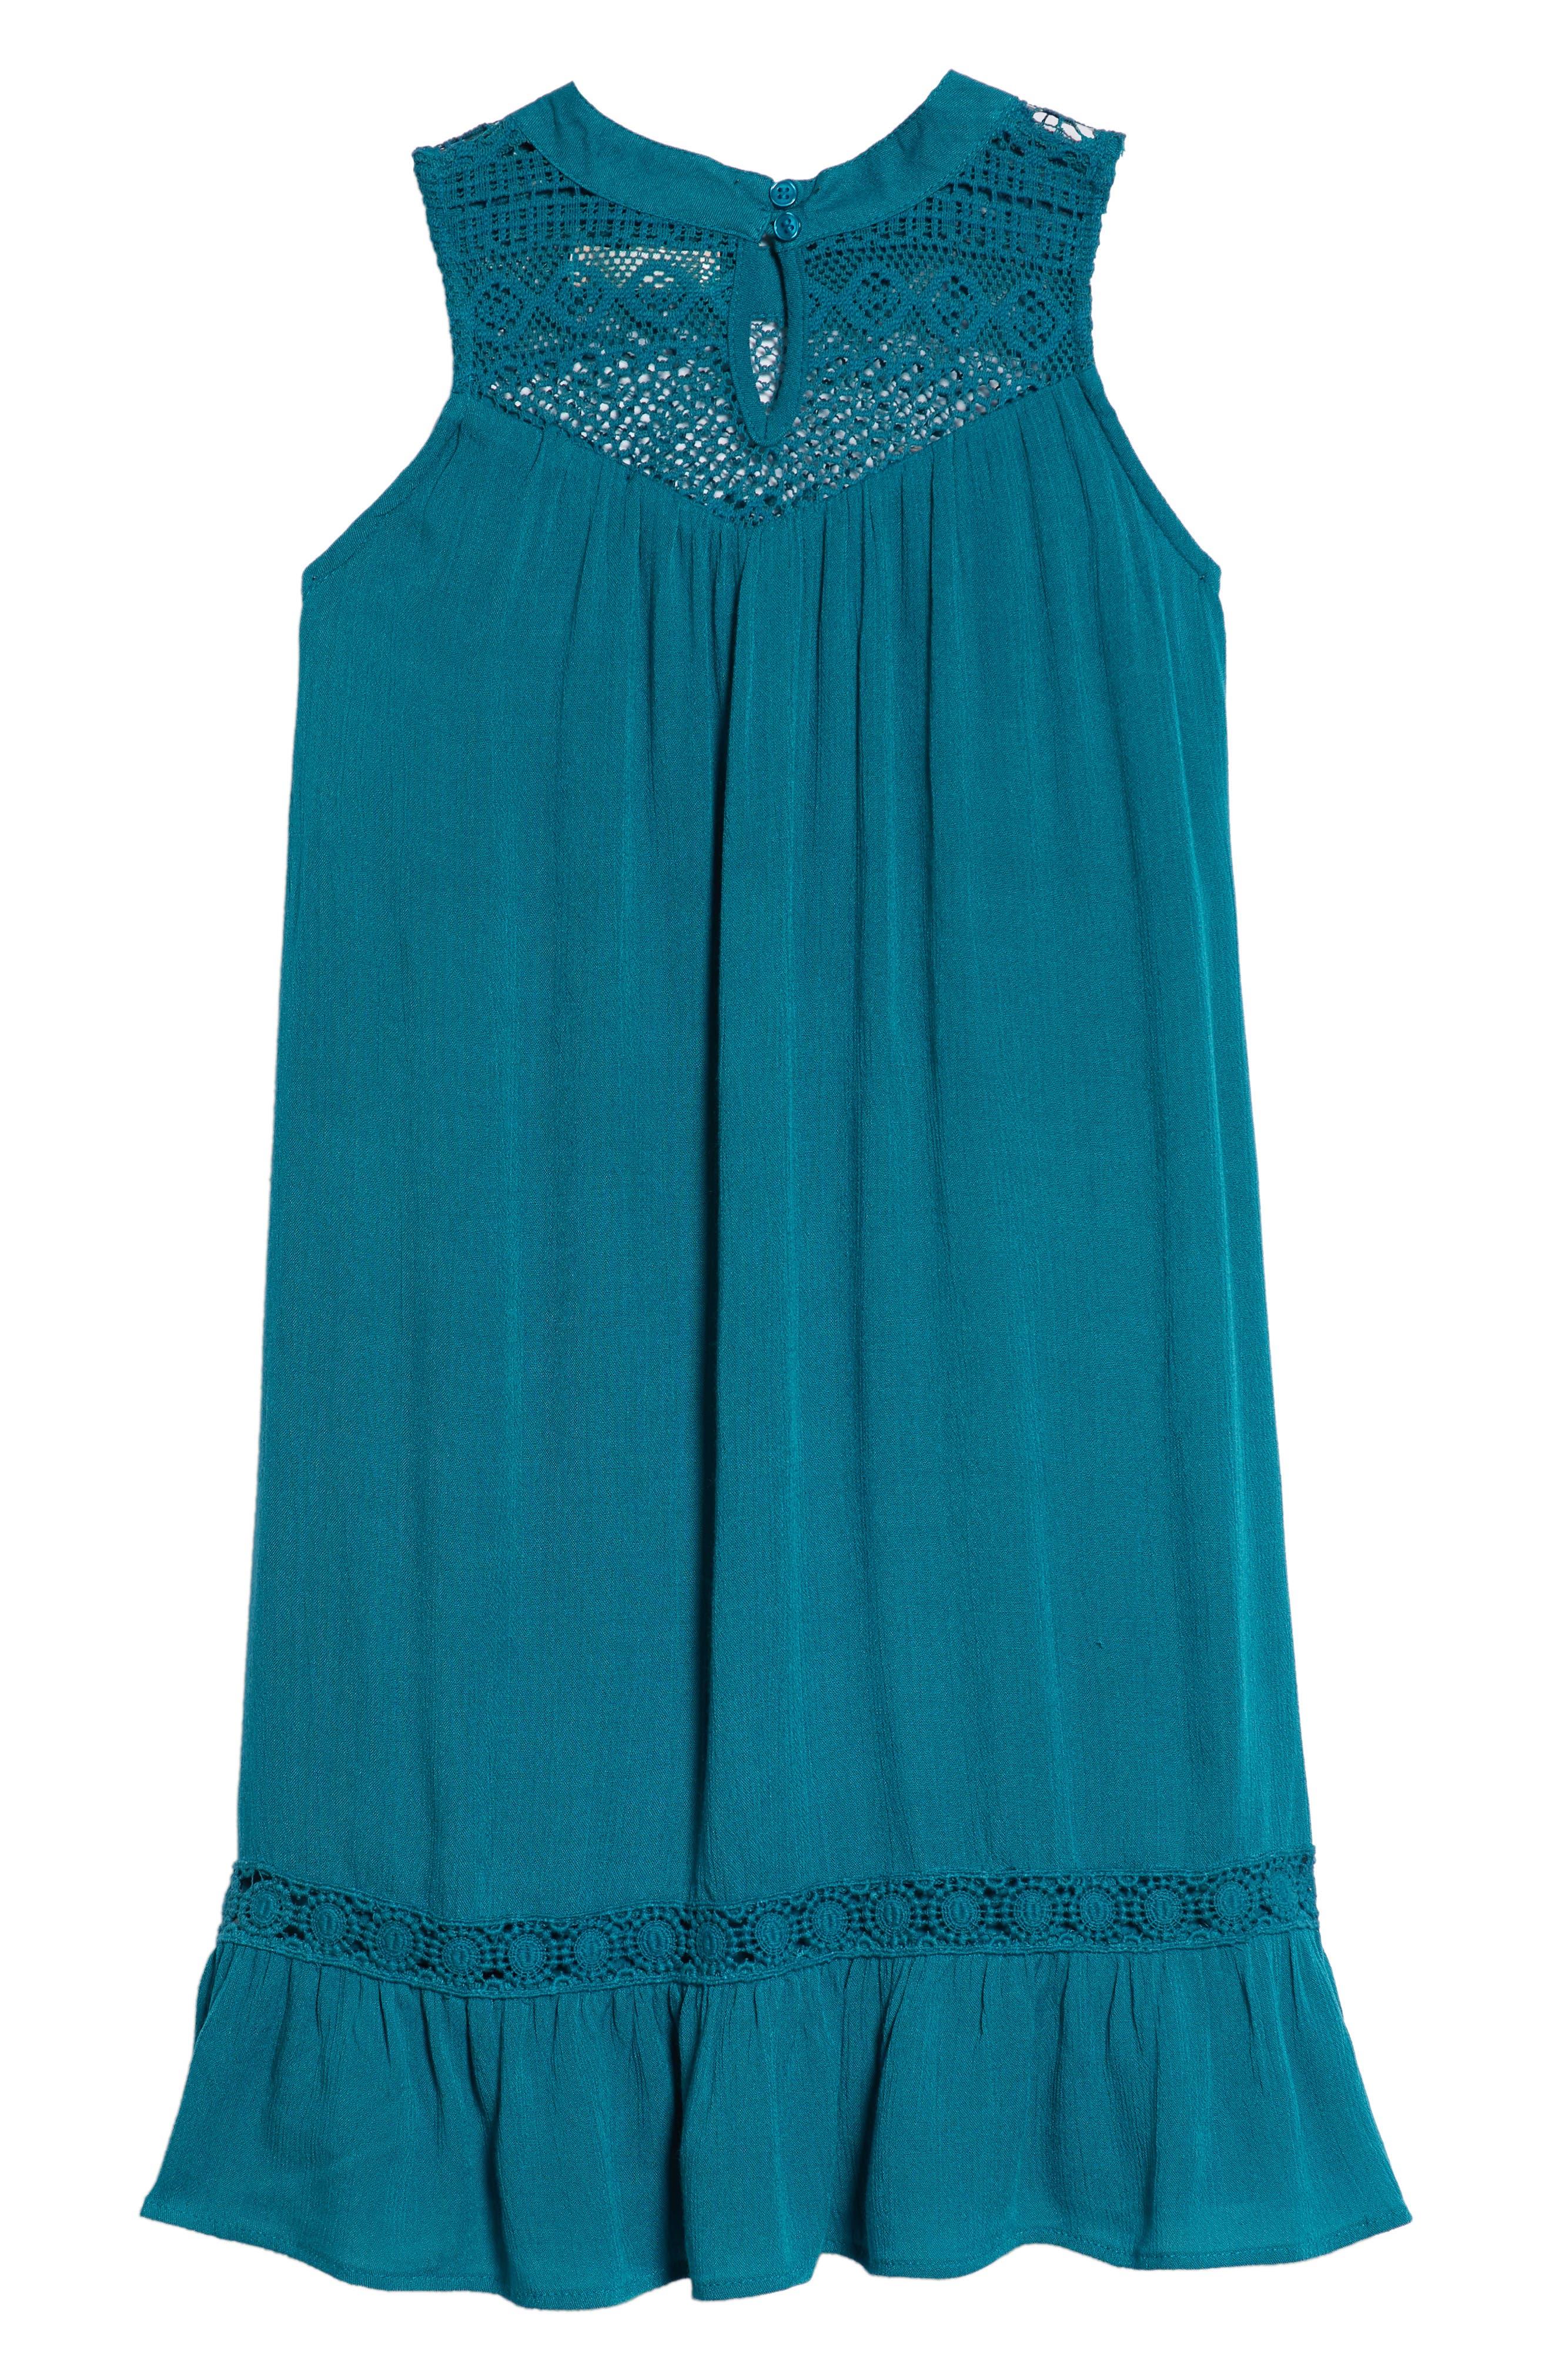 Lace Inset Ruffle Shift Dress,                             Alternate thumbnail 2, color,                             Teal